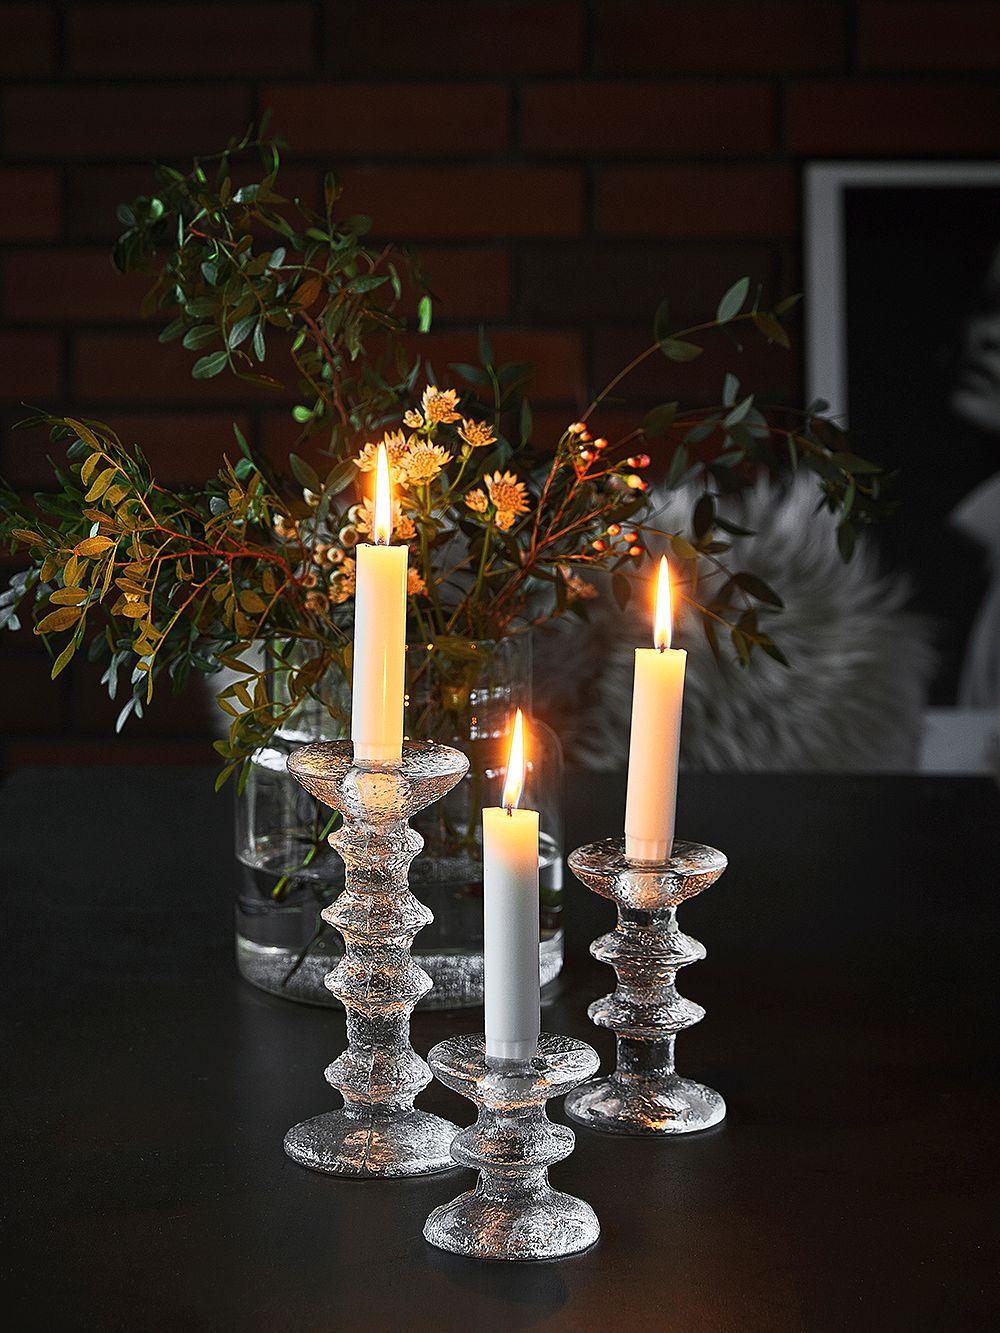 Festivo candleholders by Timo Sarpaneva